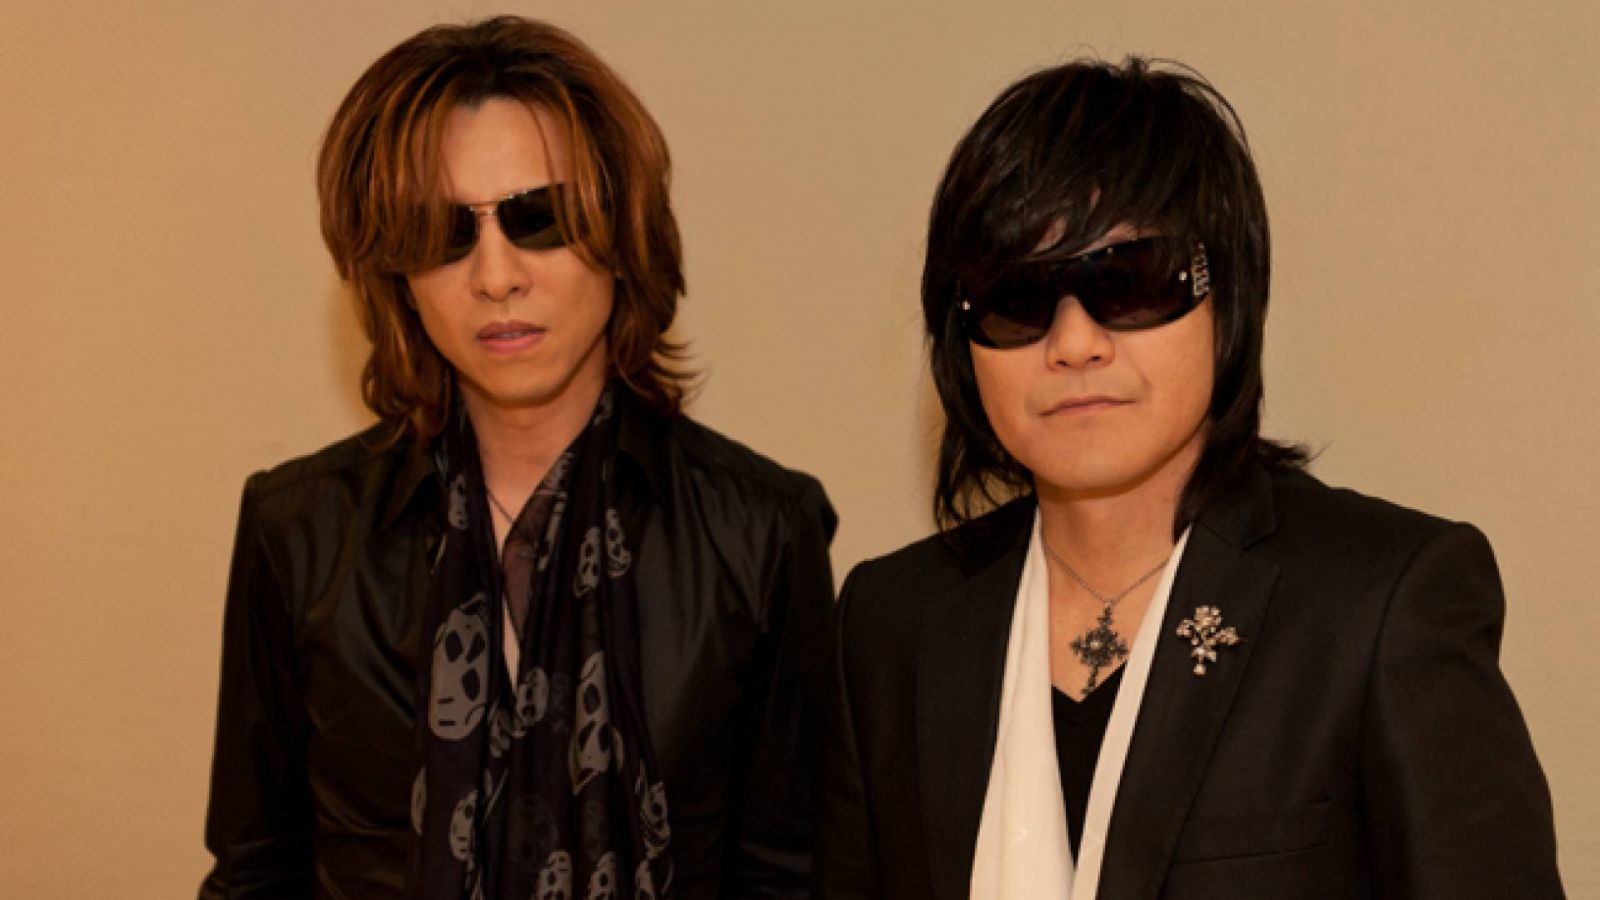 Пресс-конференция YOSHIKI и ToshI © X Japan - JaME - Didier CABOCHE